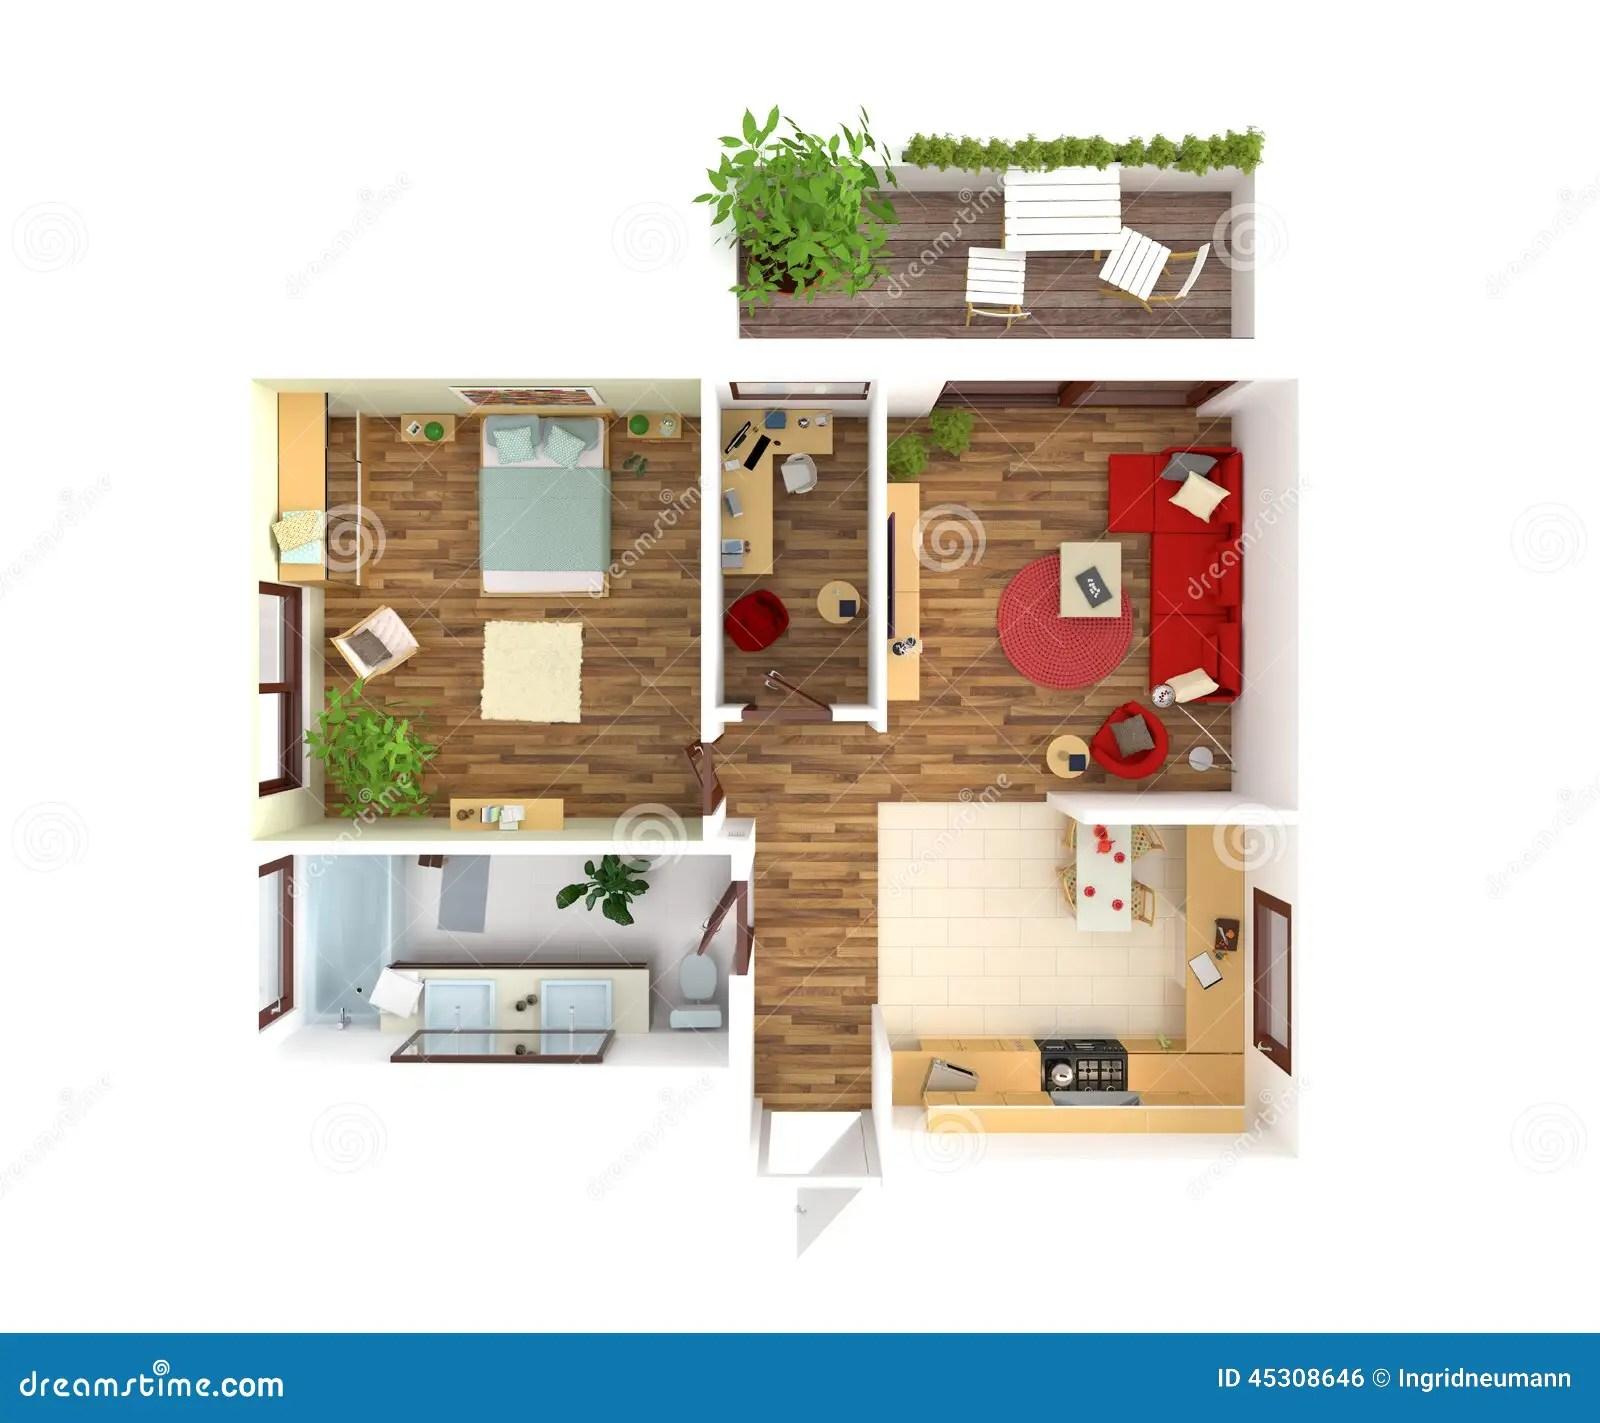 house plan top view interior design stock illustration image bedroom house floor plans bedroom bathroom house plans